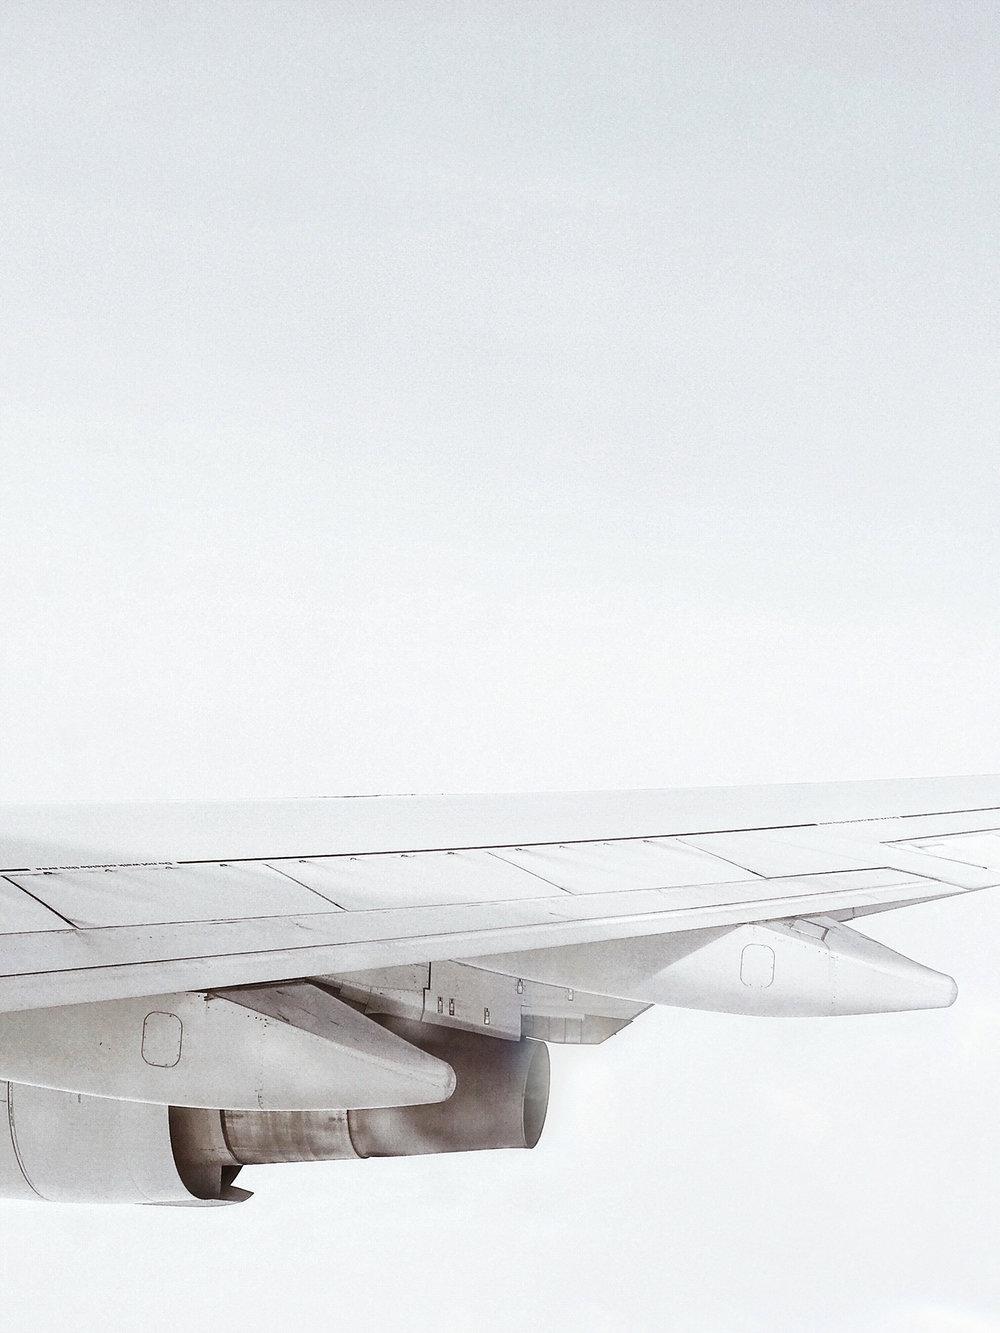 Phenne_Communication_Aviation.jpg